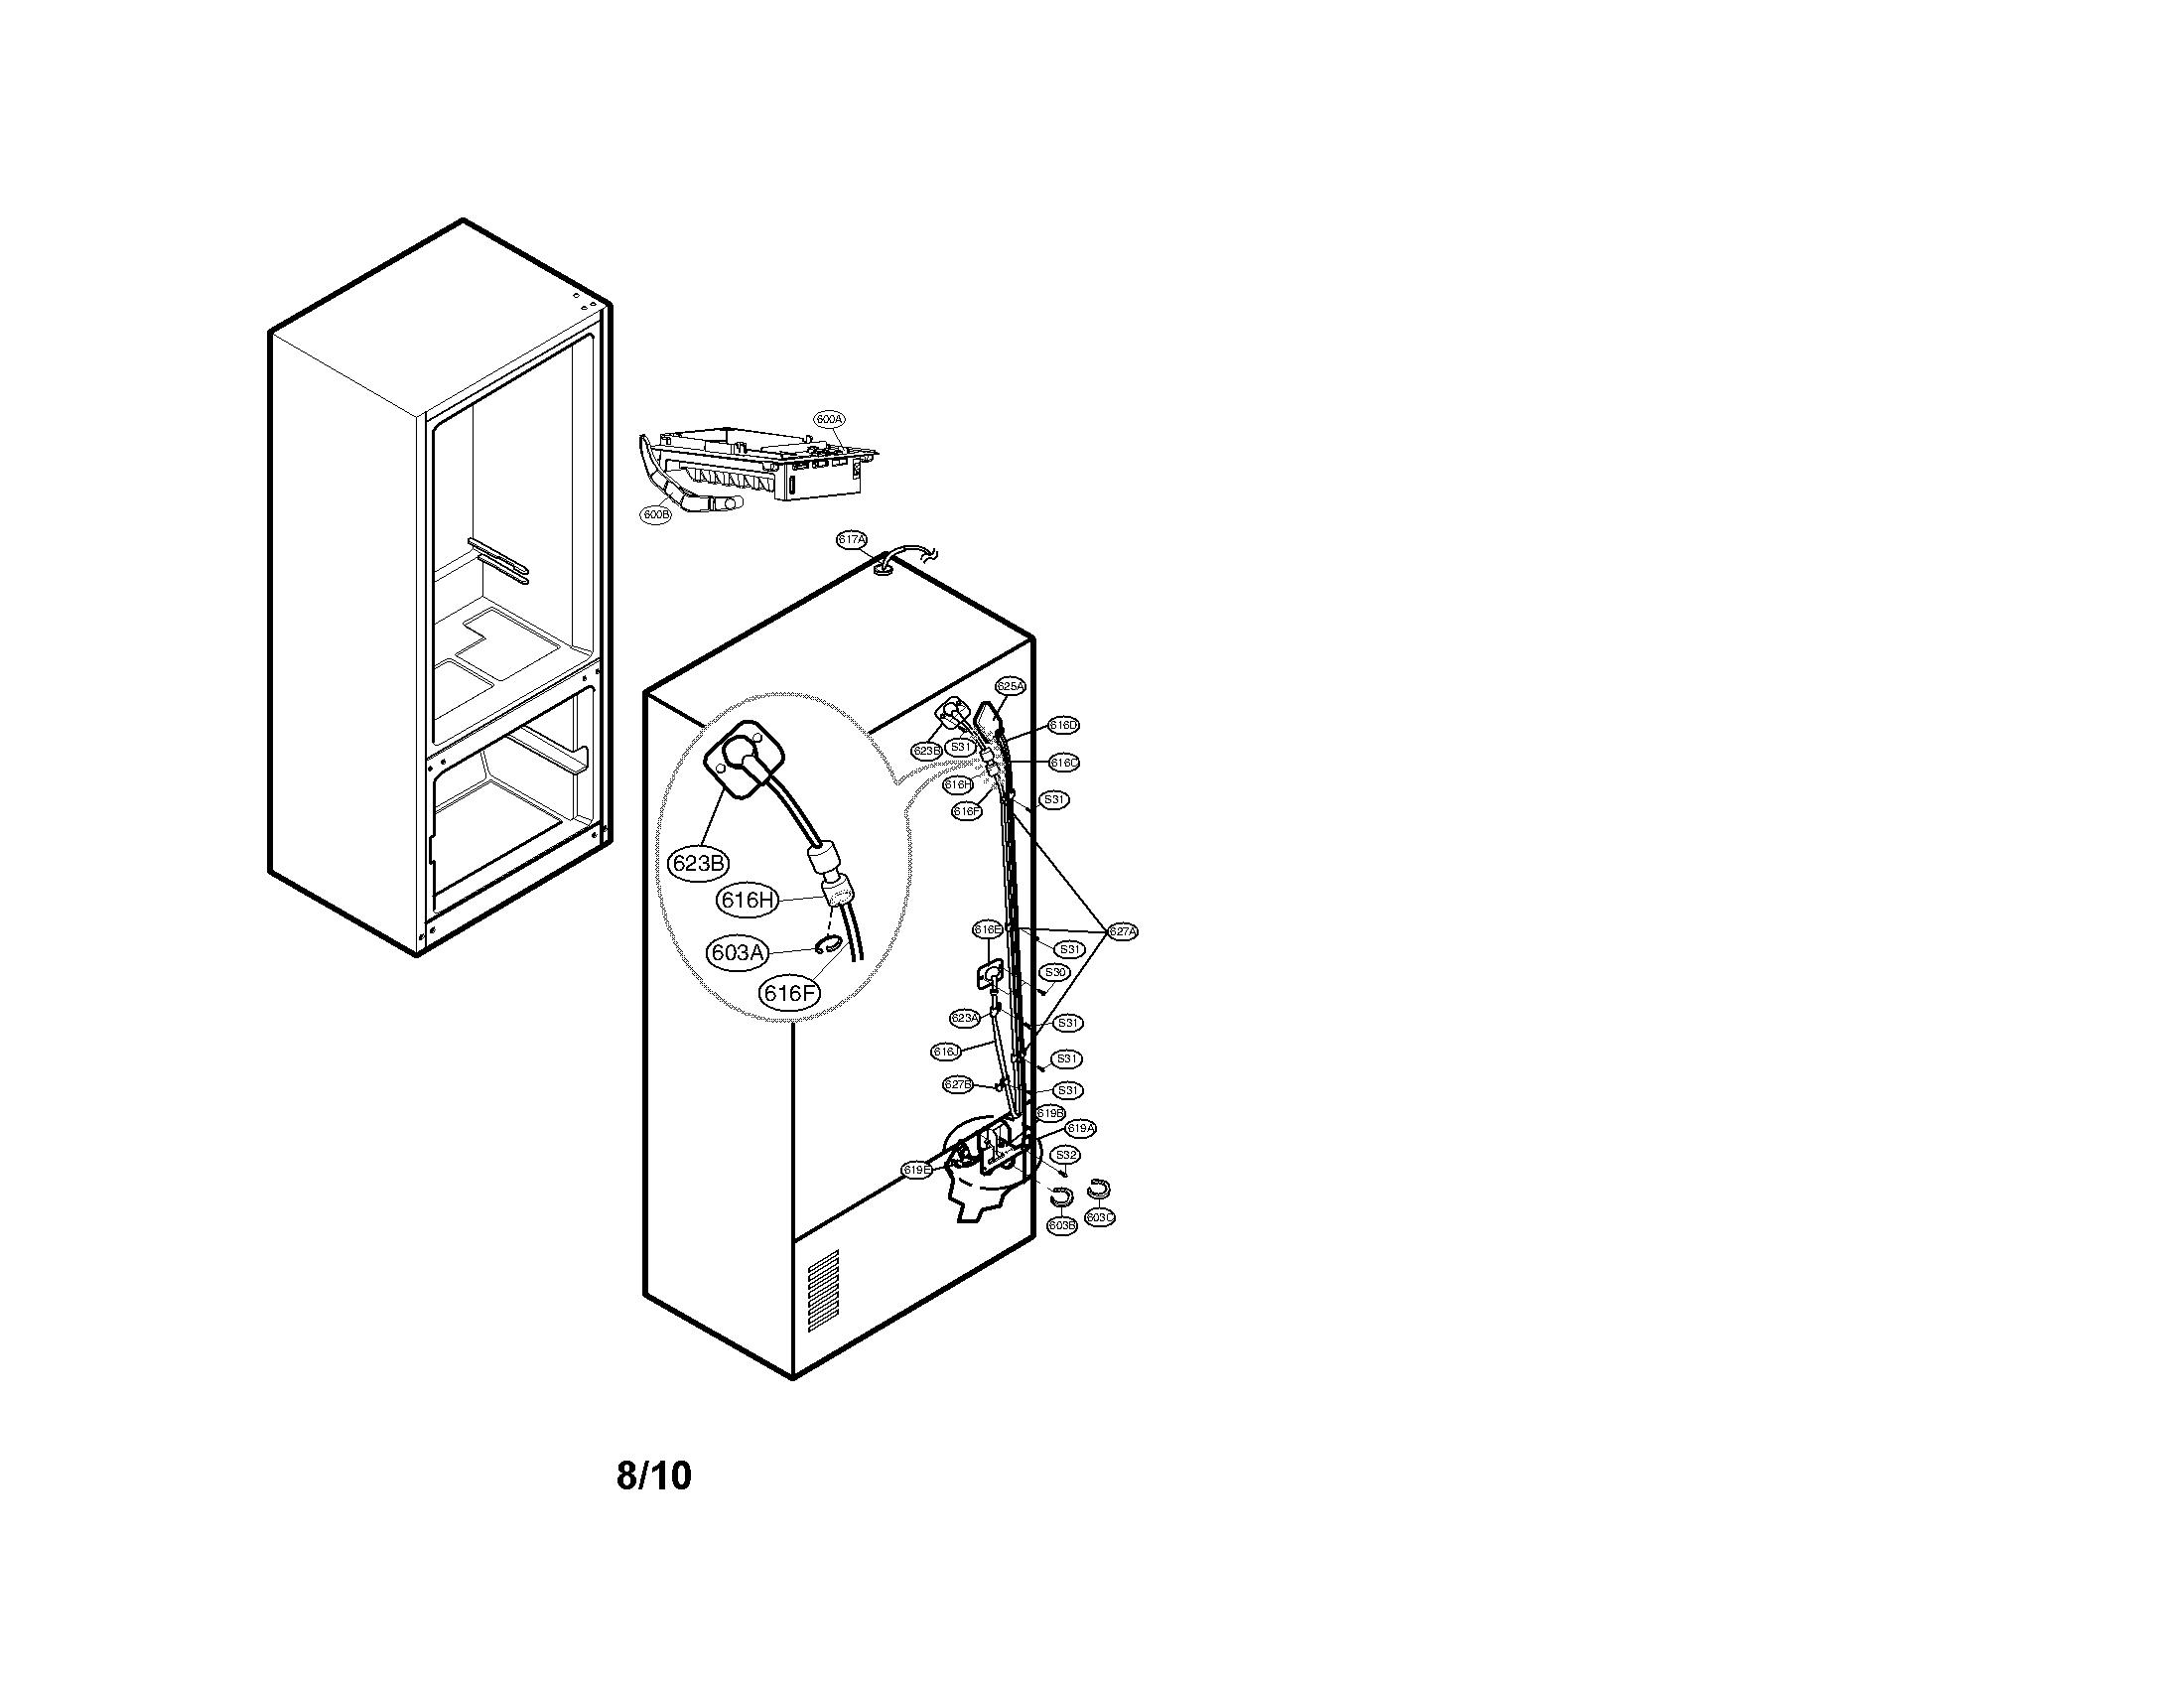 Kenmore-Elite model 79578546806 bottom-mount refrigerator